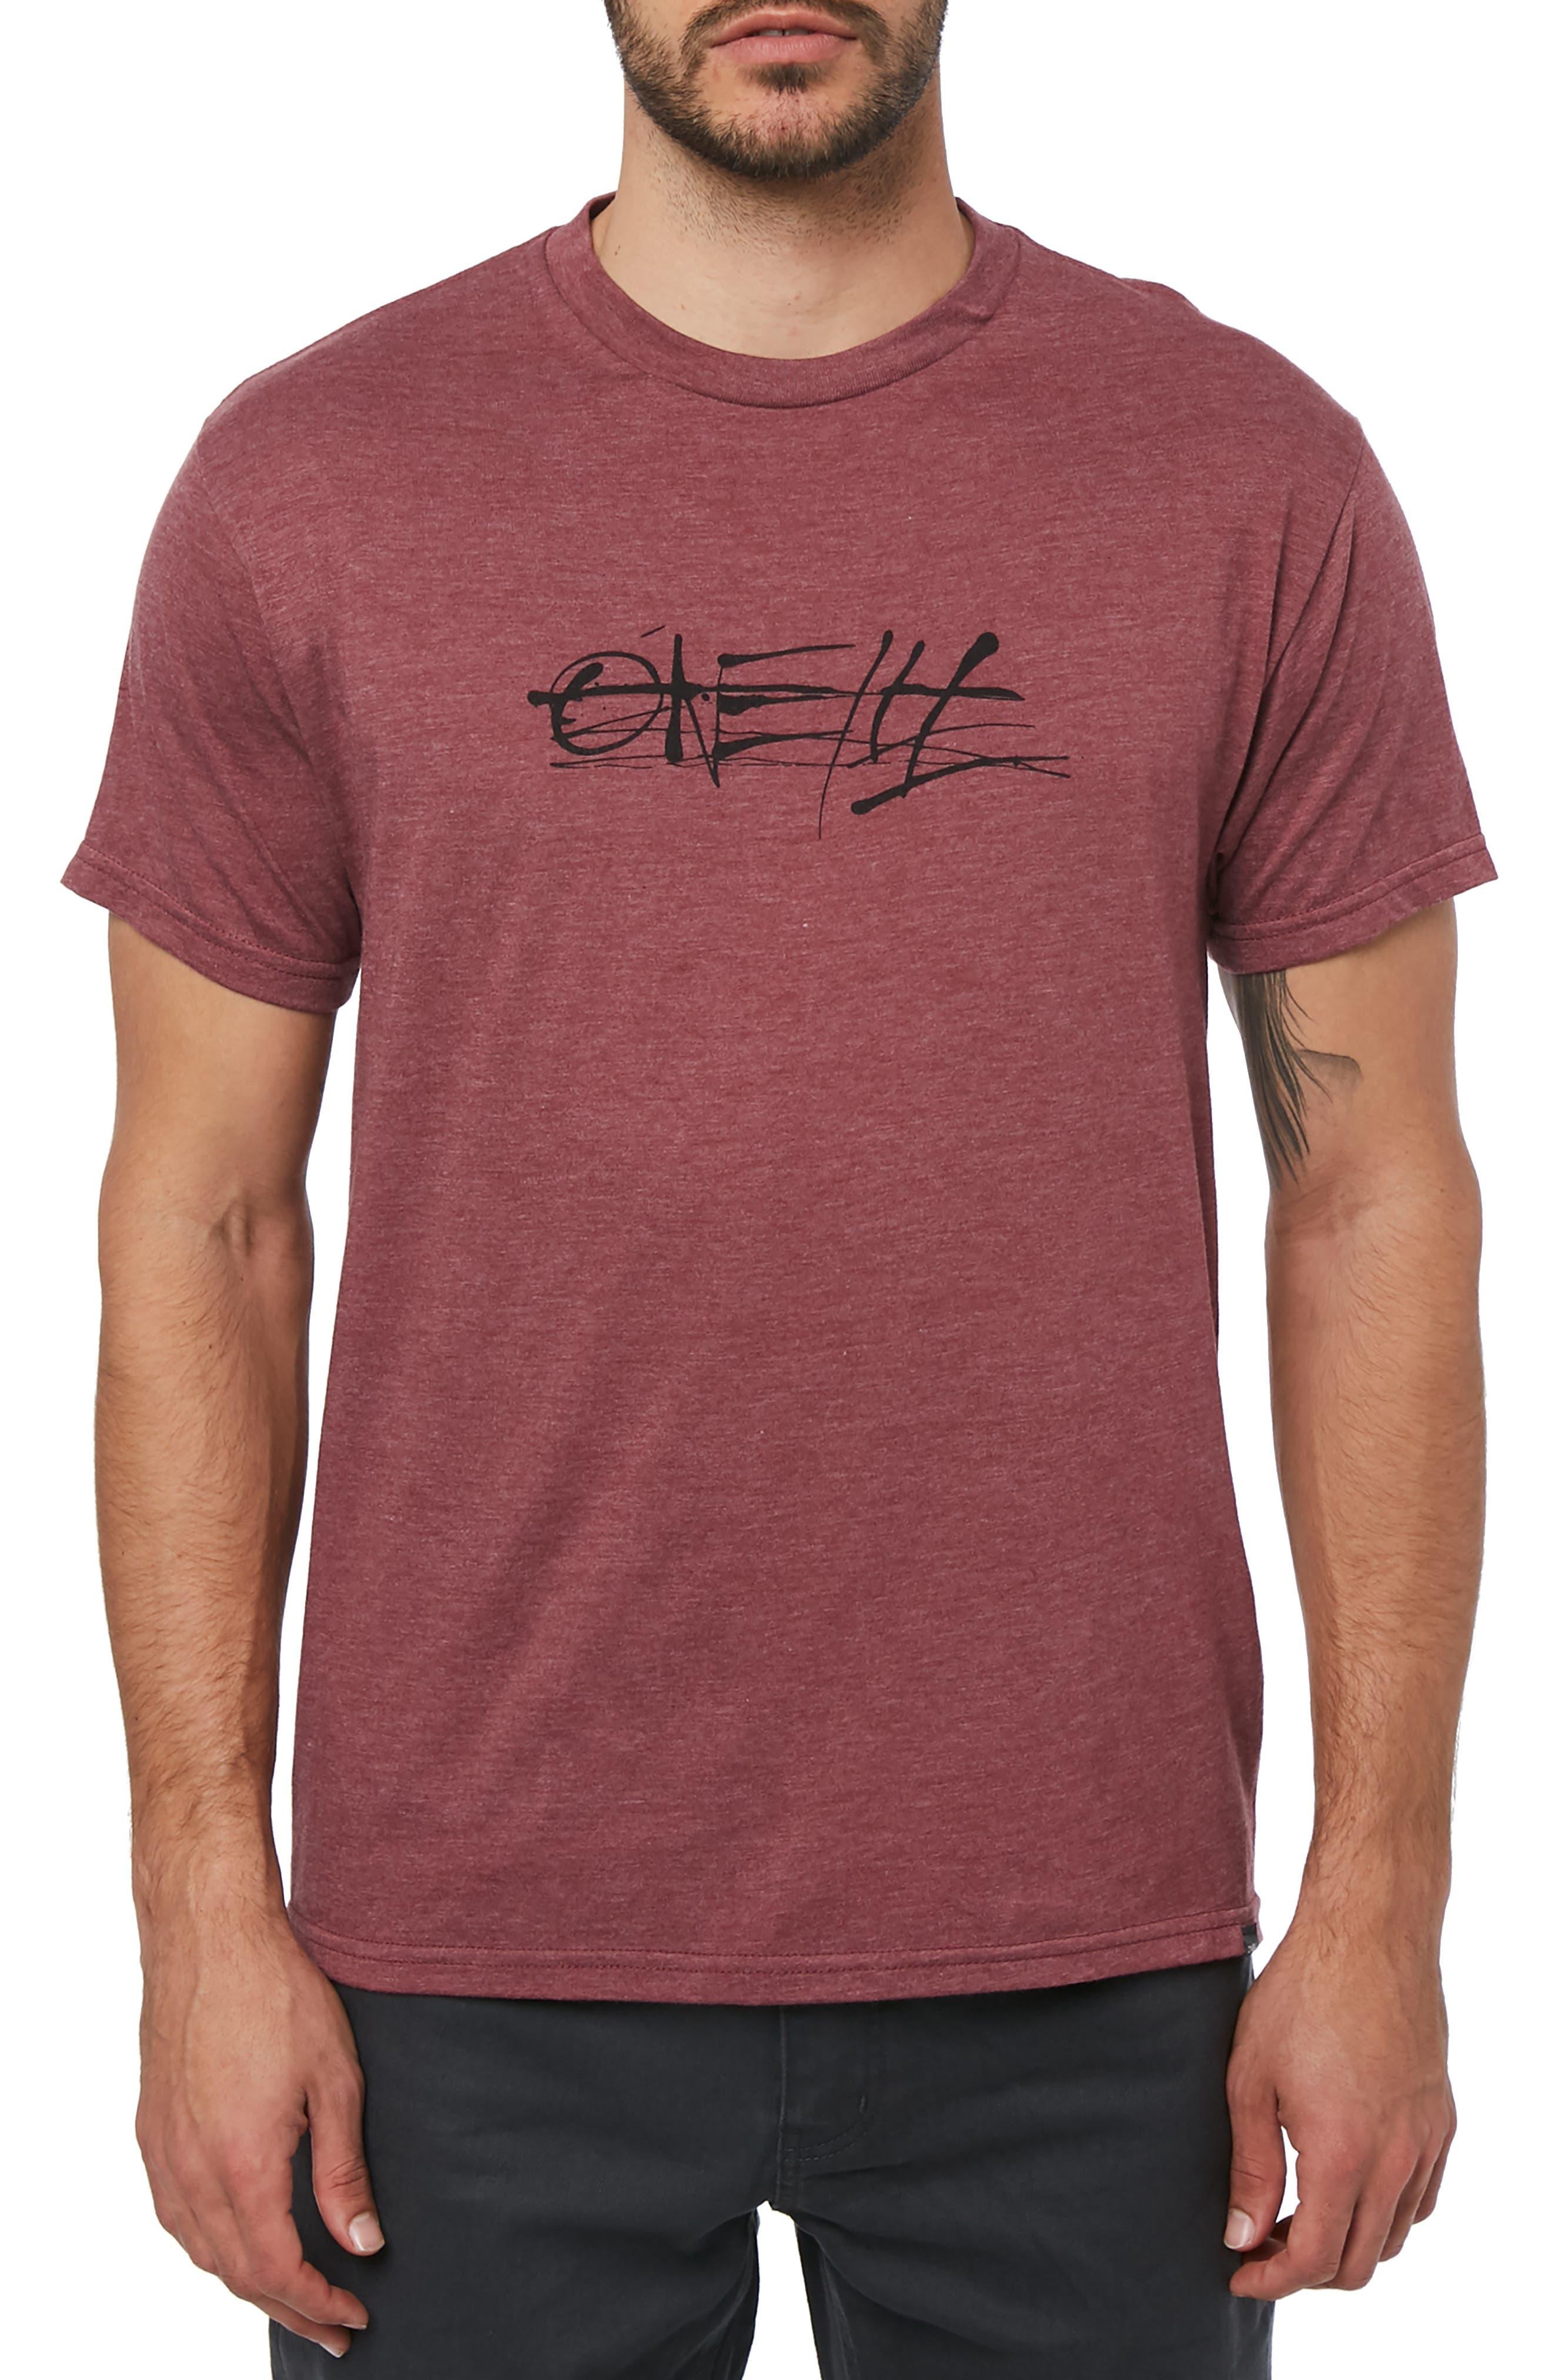 O'NEILL,                             Ink Blast Graphic T-Shirt,                             Main thumbnail 1, color,                             930